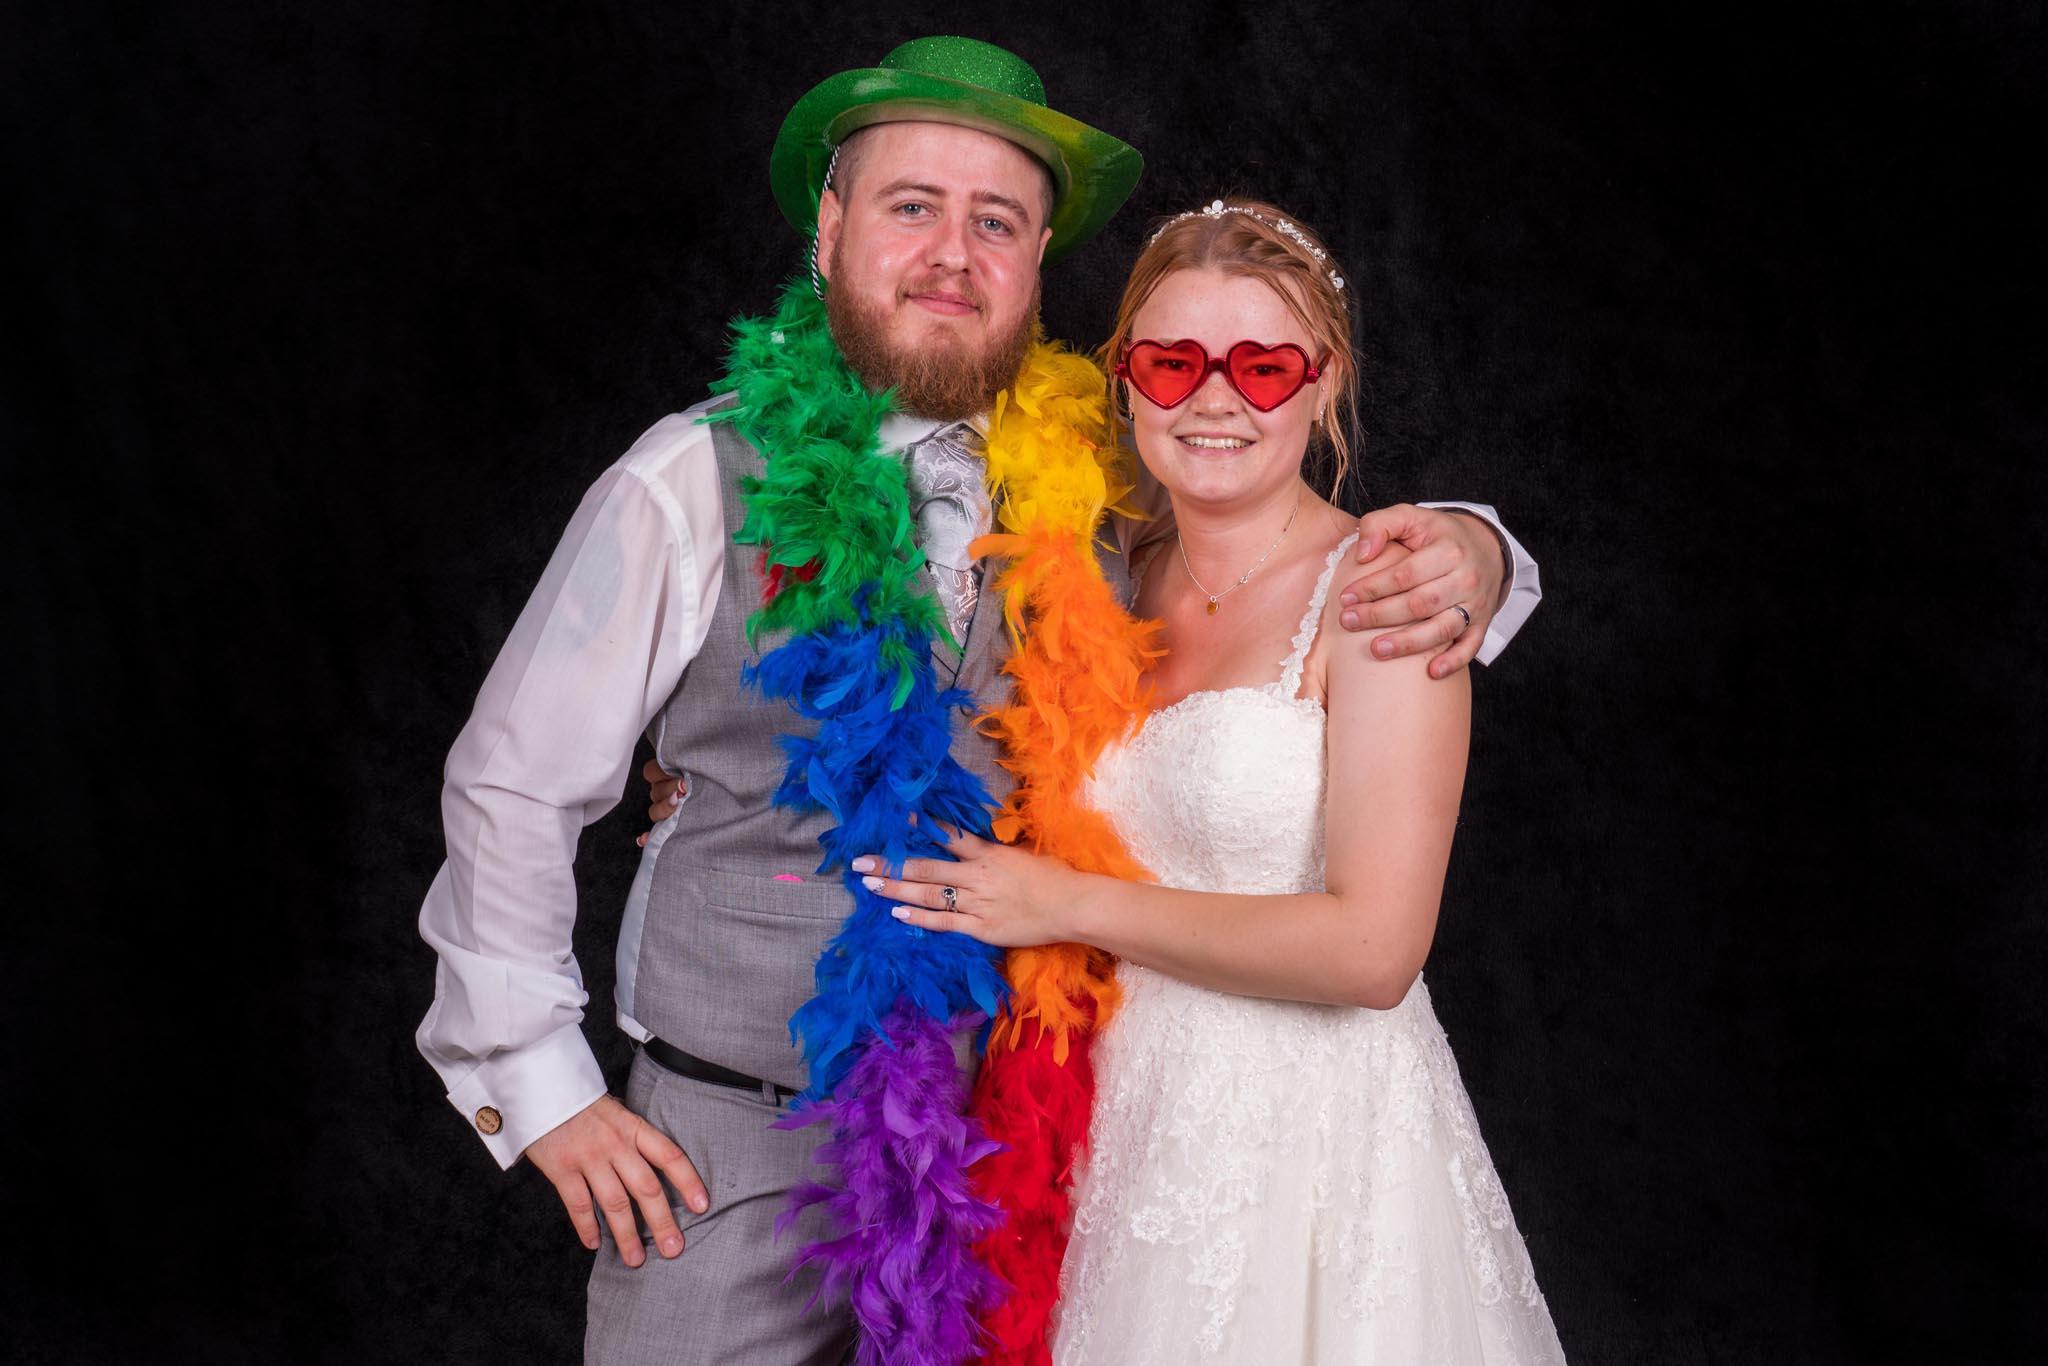 1123-Photo-Booth-Luke-Yasmin-The-Rayleigh-Club-Wedding-Photography.jpg